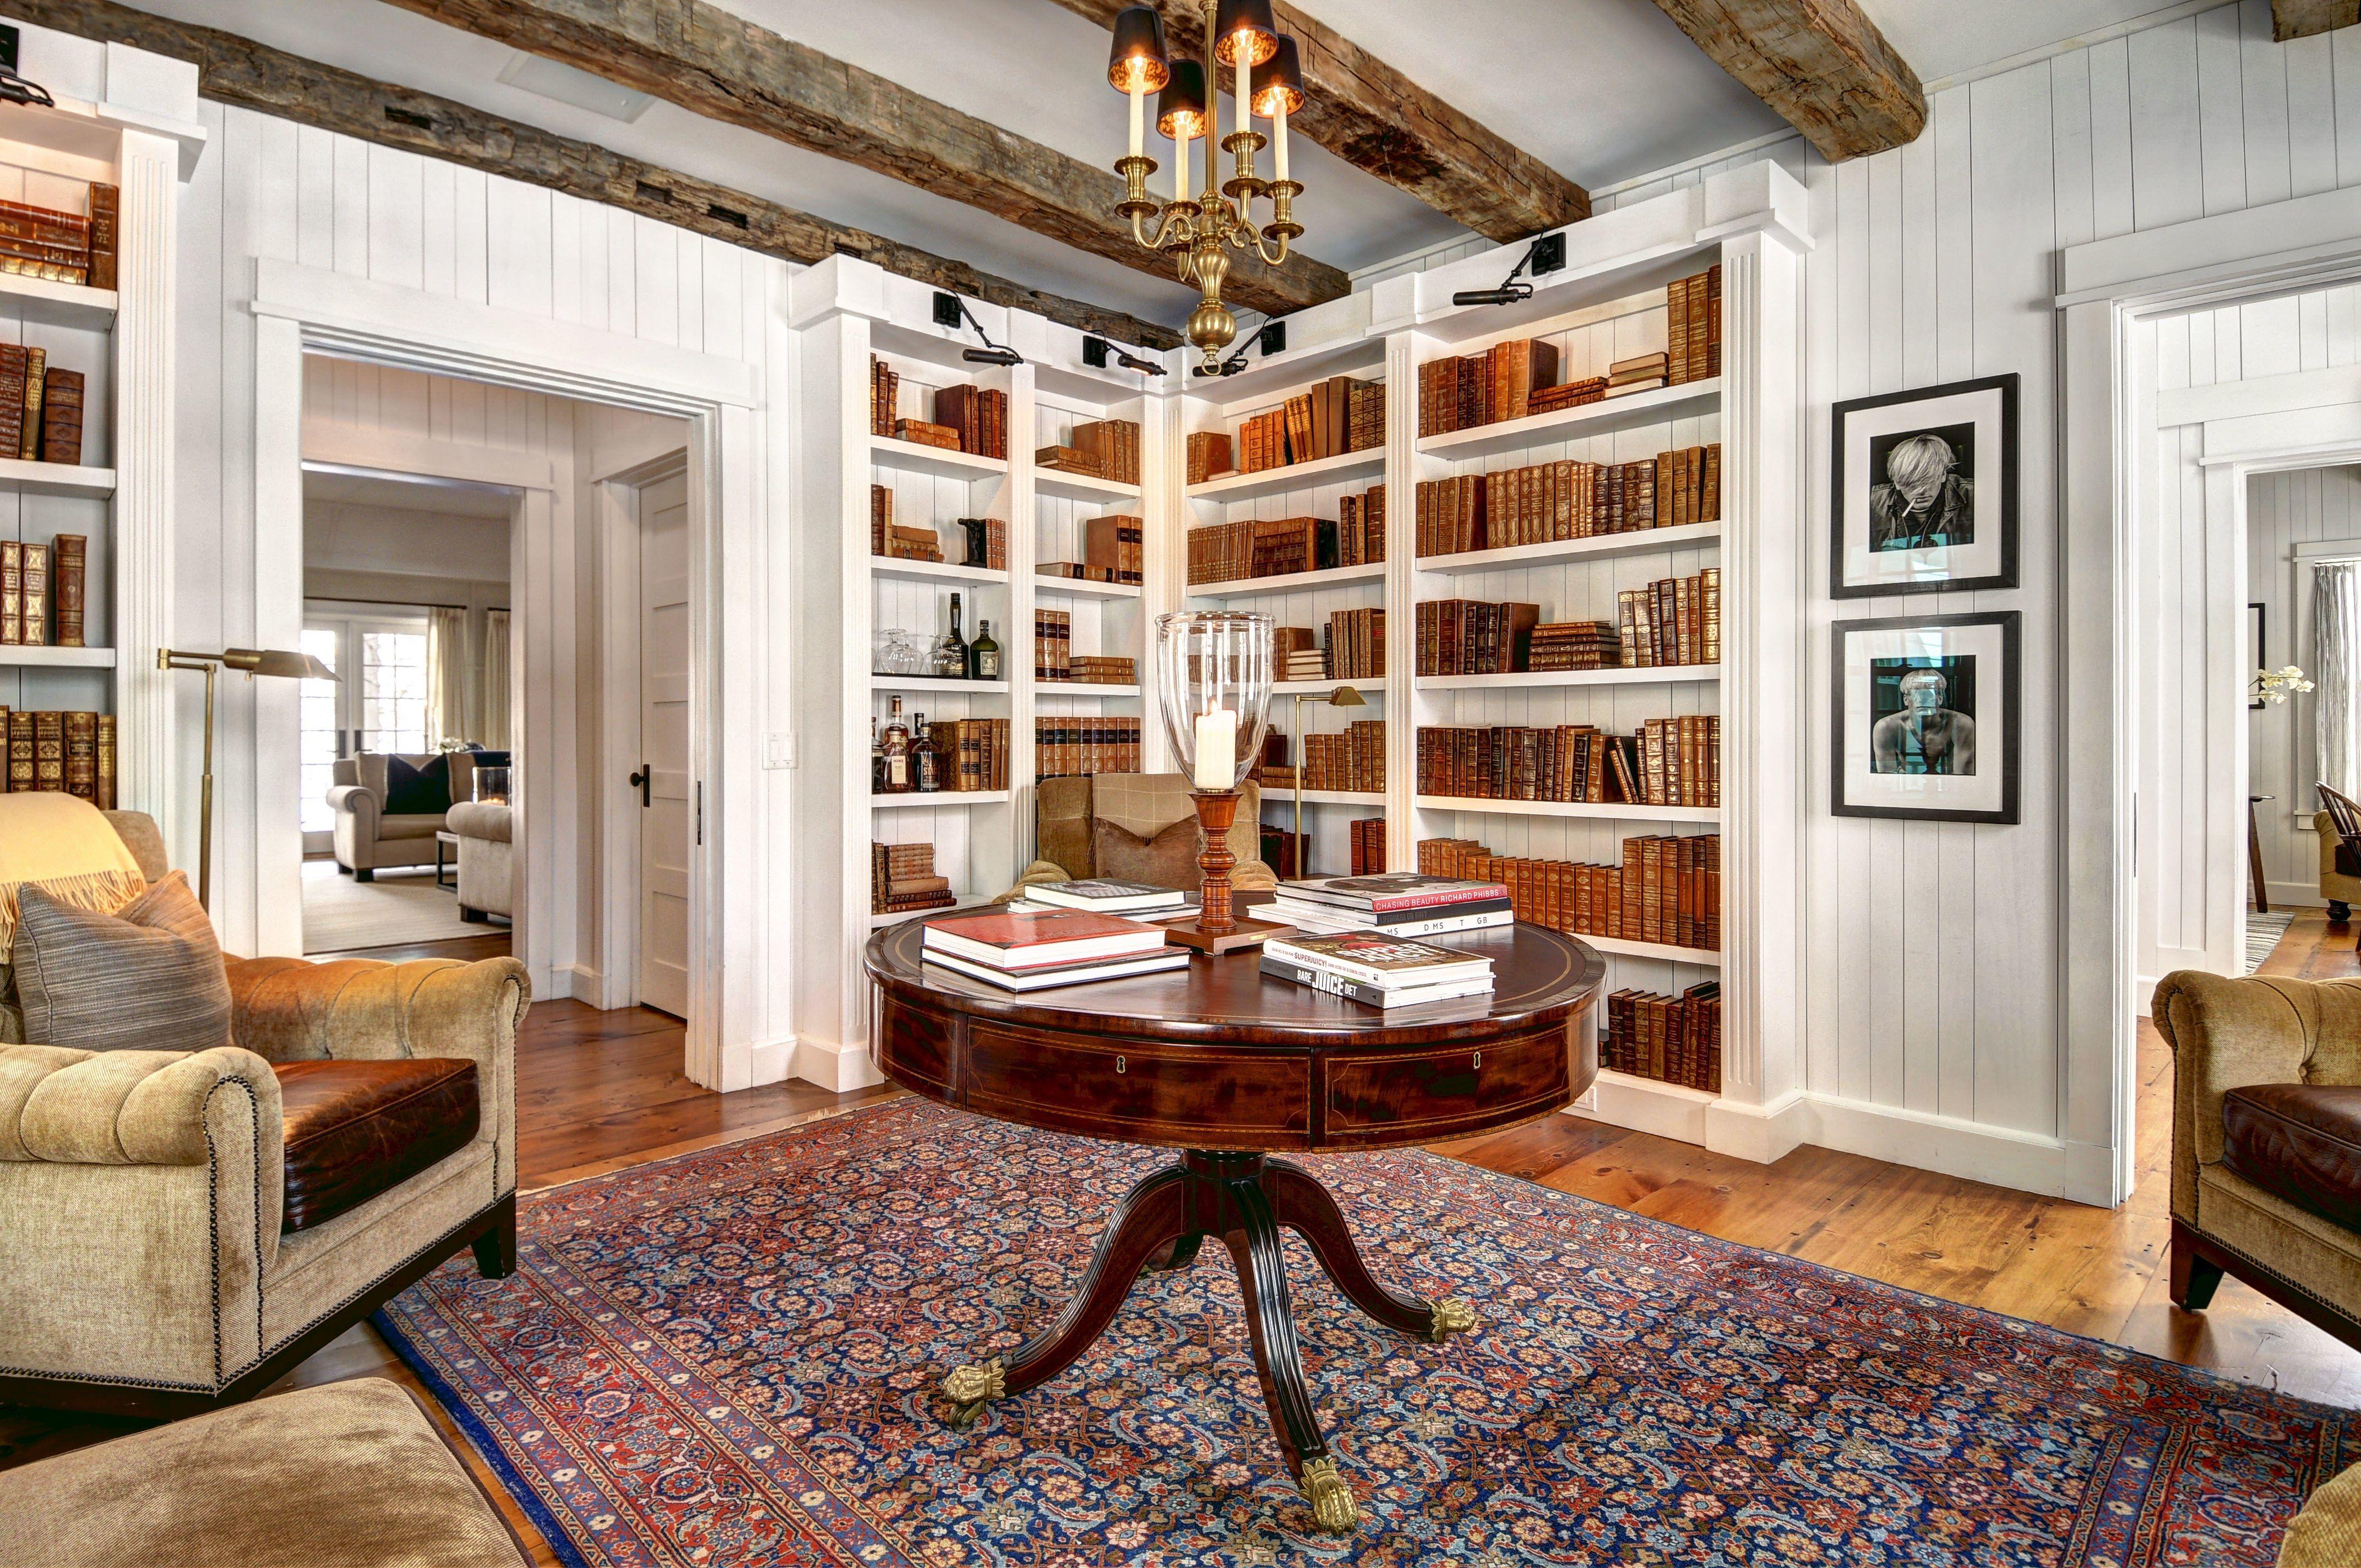 10 Biblioth Ques Styl Es - Chez Soi Photo Corcoran